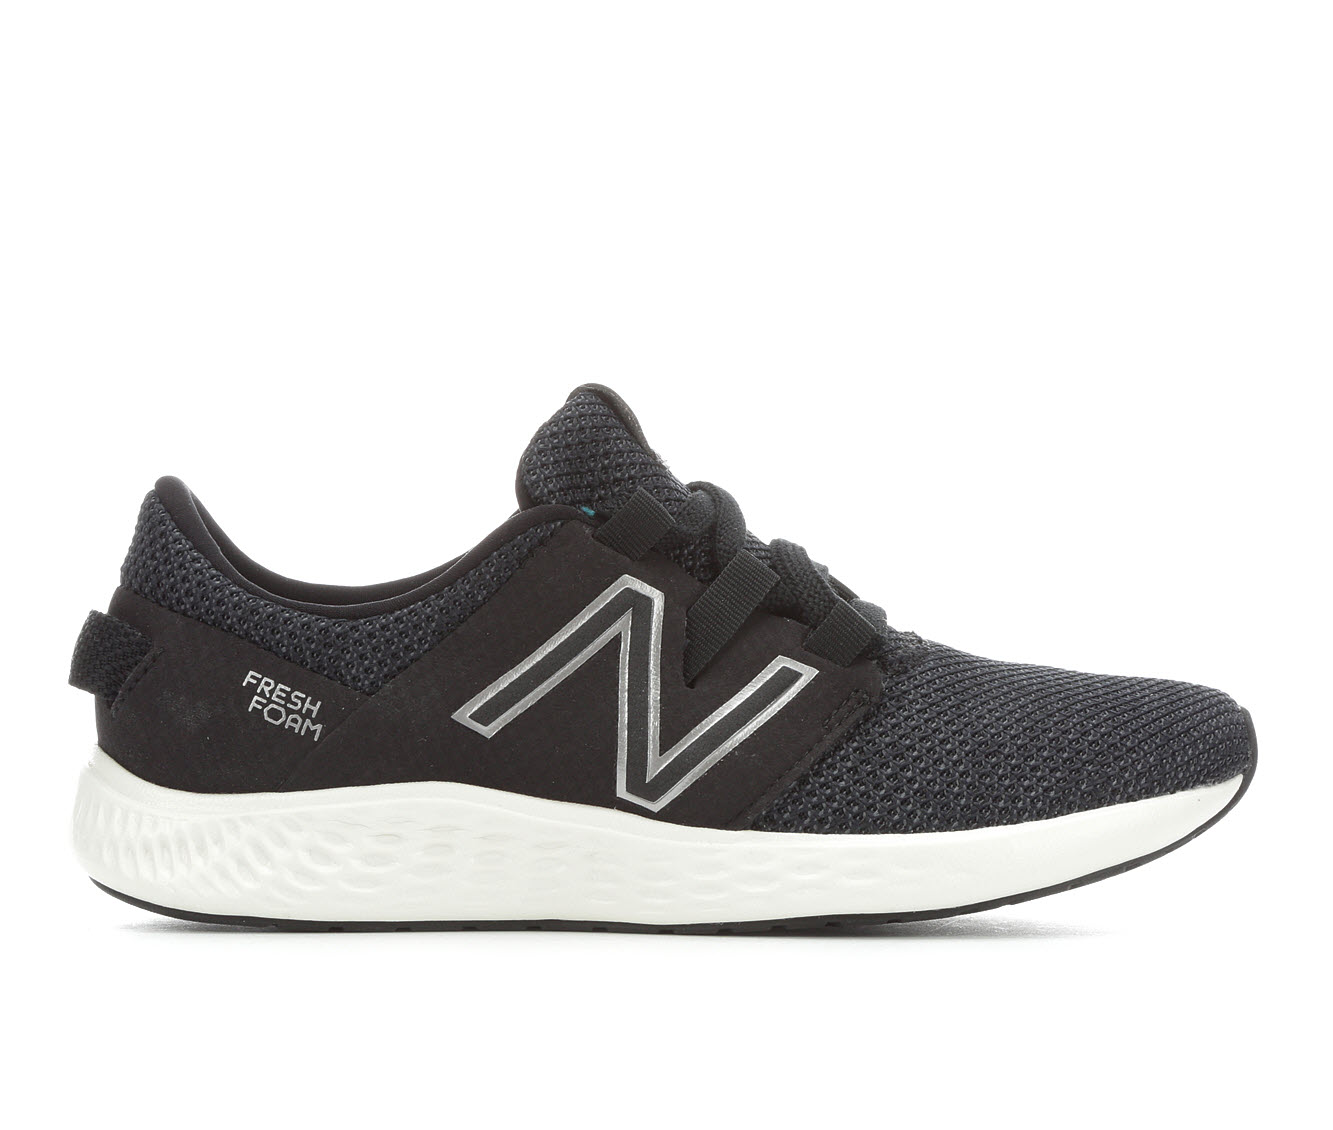 New Balance Fresh Foam Vero Racer Women's Athletic Shoe (Black)